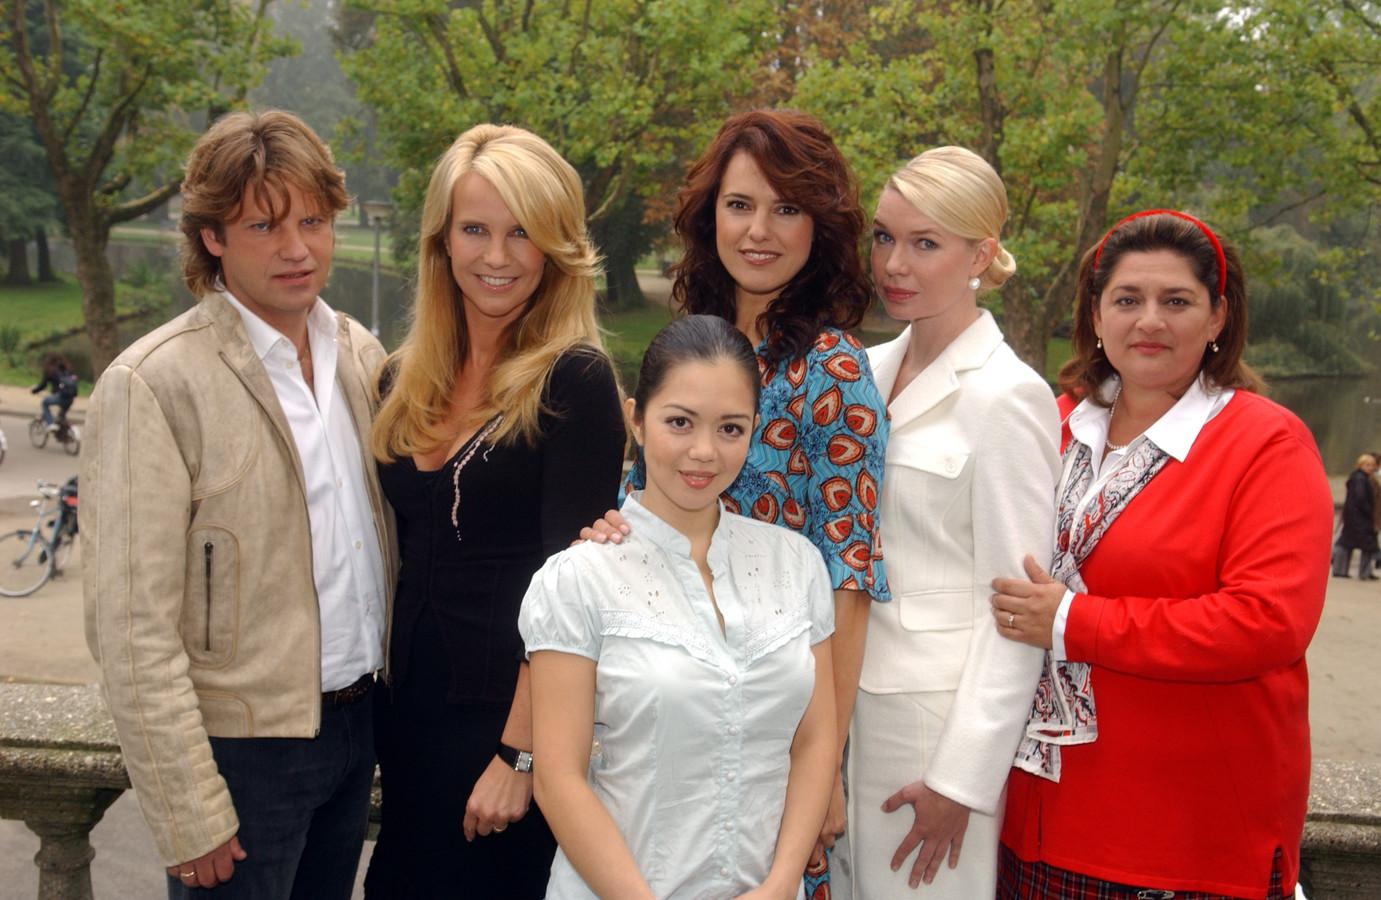 De  hoofdrolspelers van Gooische Vrouwen Peter Paul Muller, Linda de Mol, Cysteine Carreon, Susan Visser, Tjitske Reidinga en Annet Malherbe.